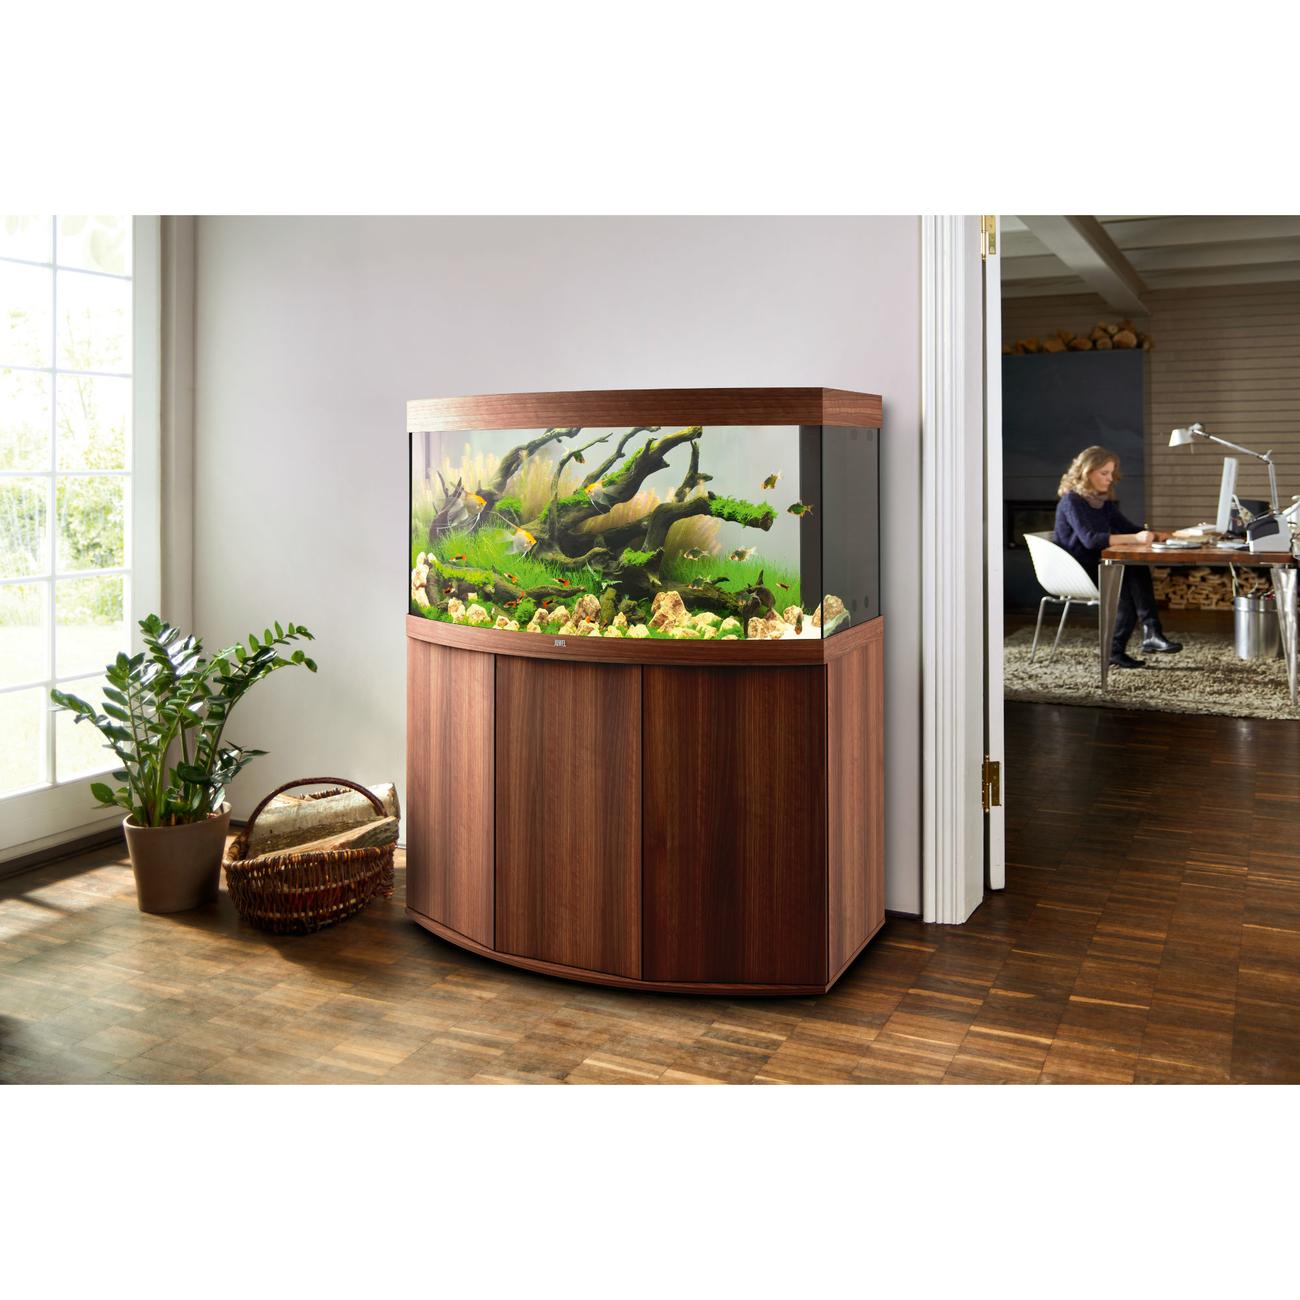 Juwel Vision 260 LED Aquarium mit Unterschrank SBX, Bild 15